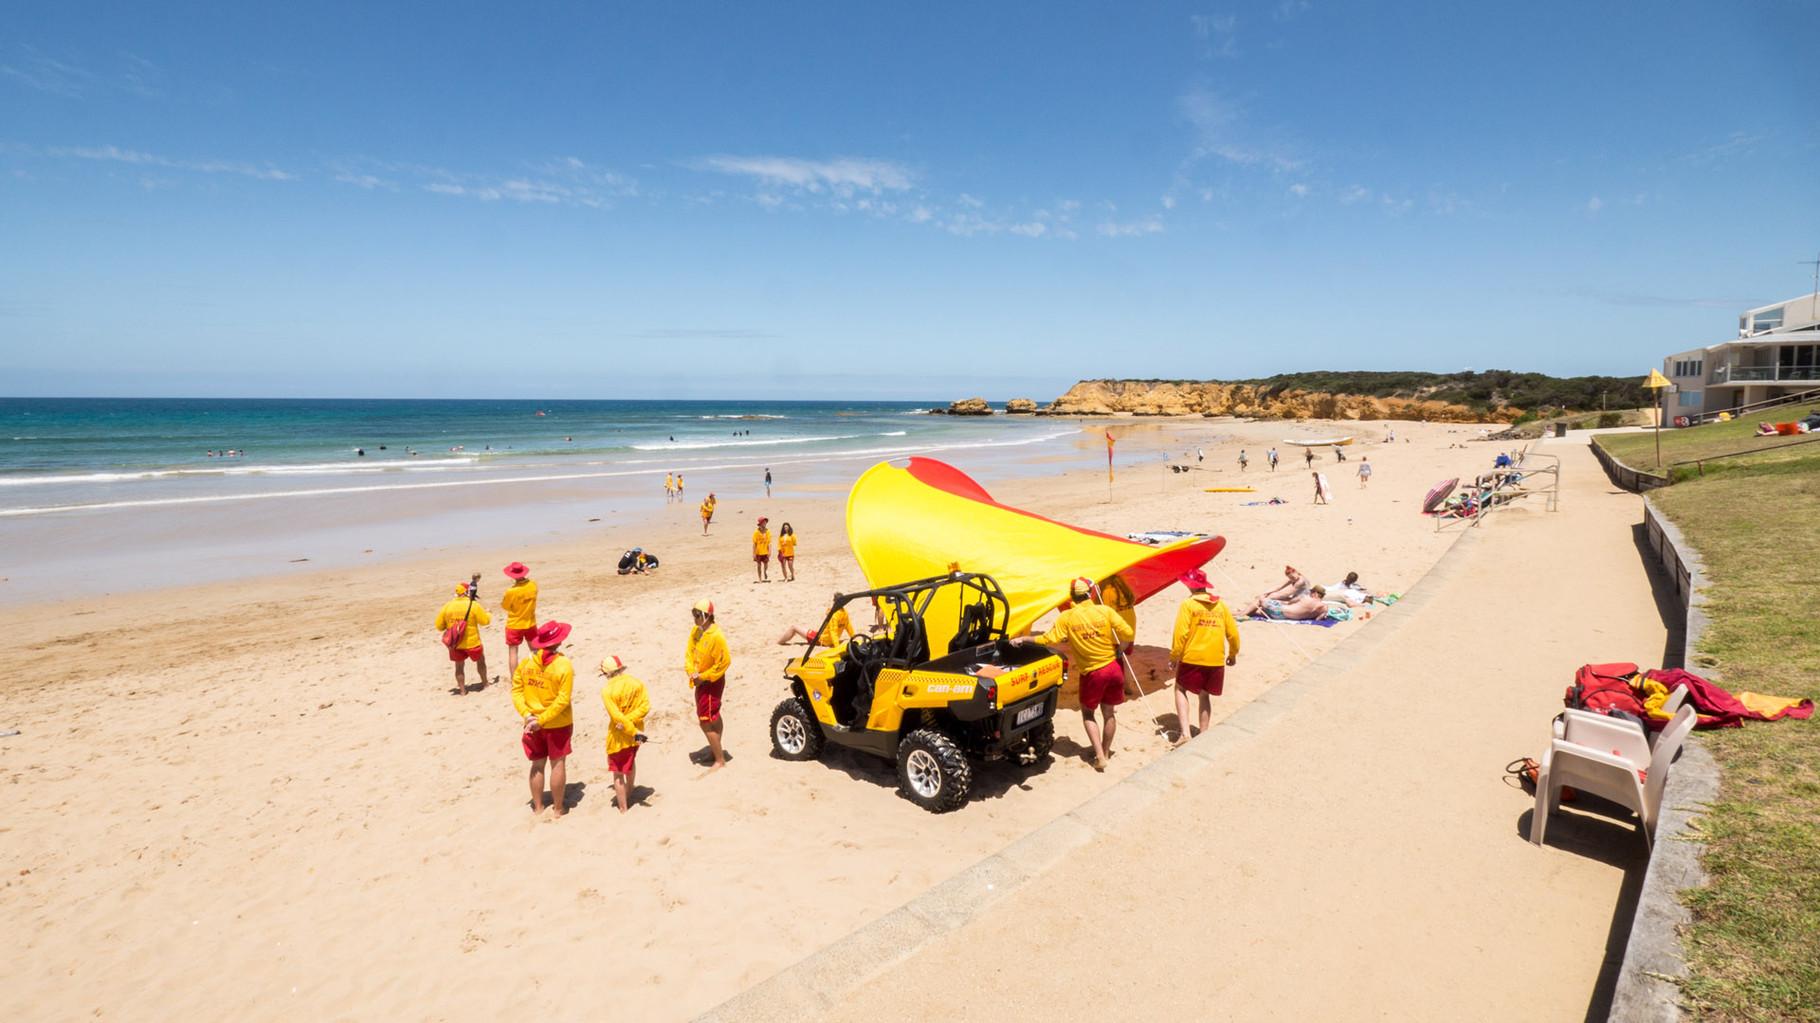 Surf Watch at Torquay Surf Beach [Australia, 2014]